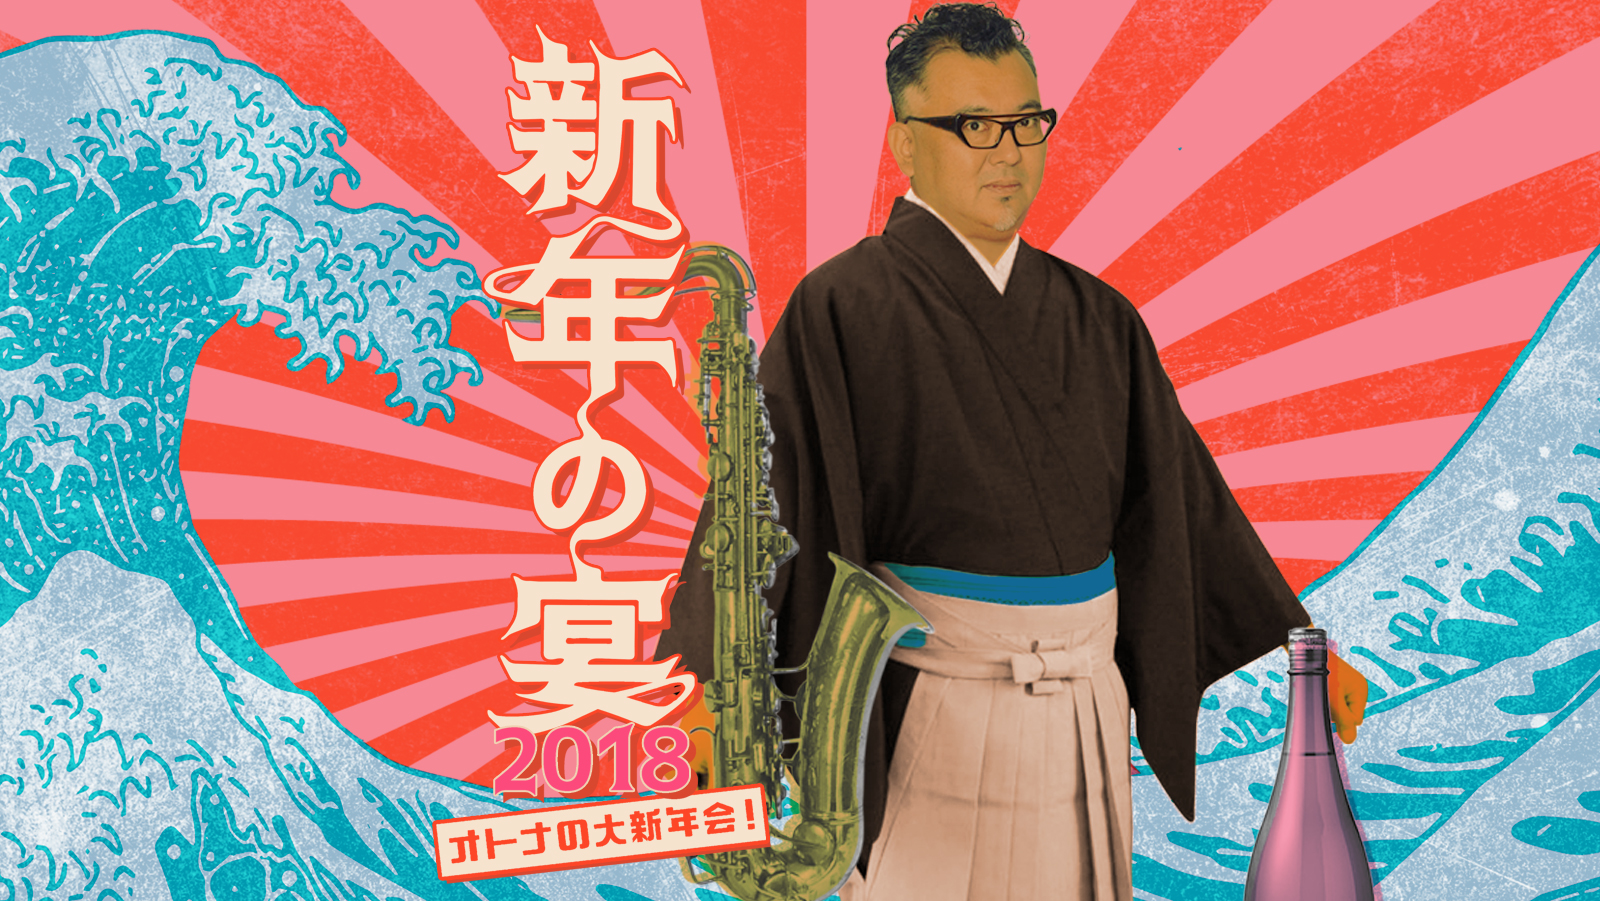 2018.1.2.tue.-1.3.wed. 新年の宴 2018 〜オトナの大新年会!〜 Presented by KUNIKAZU TANAKA x Motion Blue yokohama